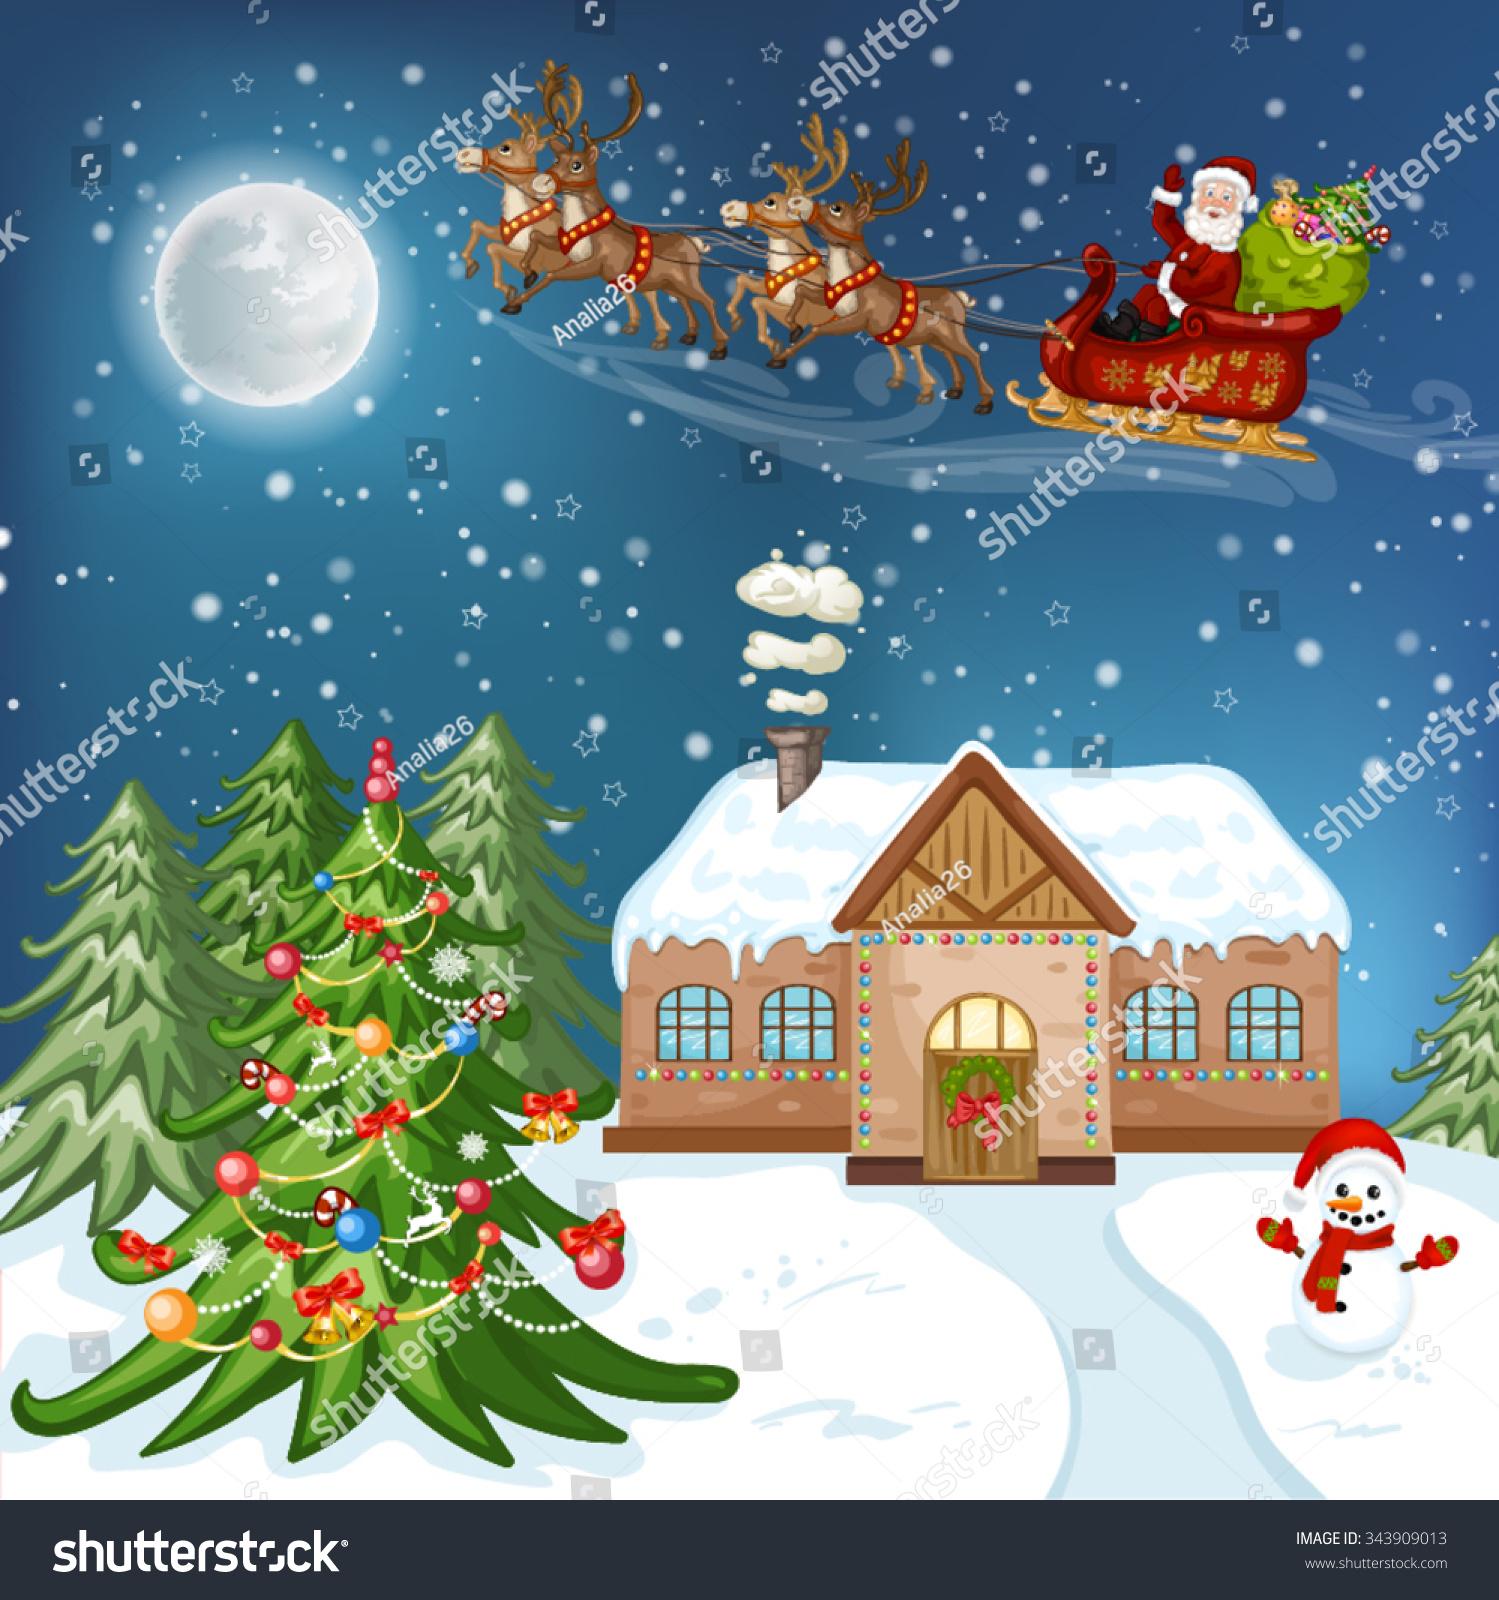 Merry Christmas Card Illustration Christmas House Stock Vector Royalty Free 343909013